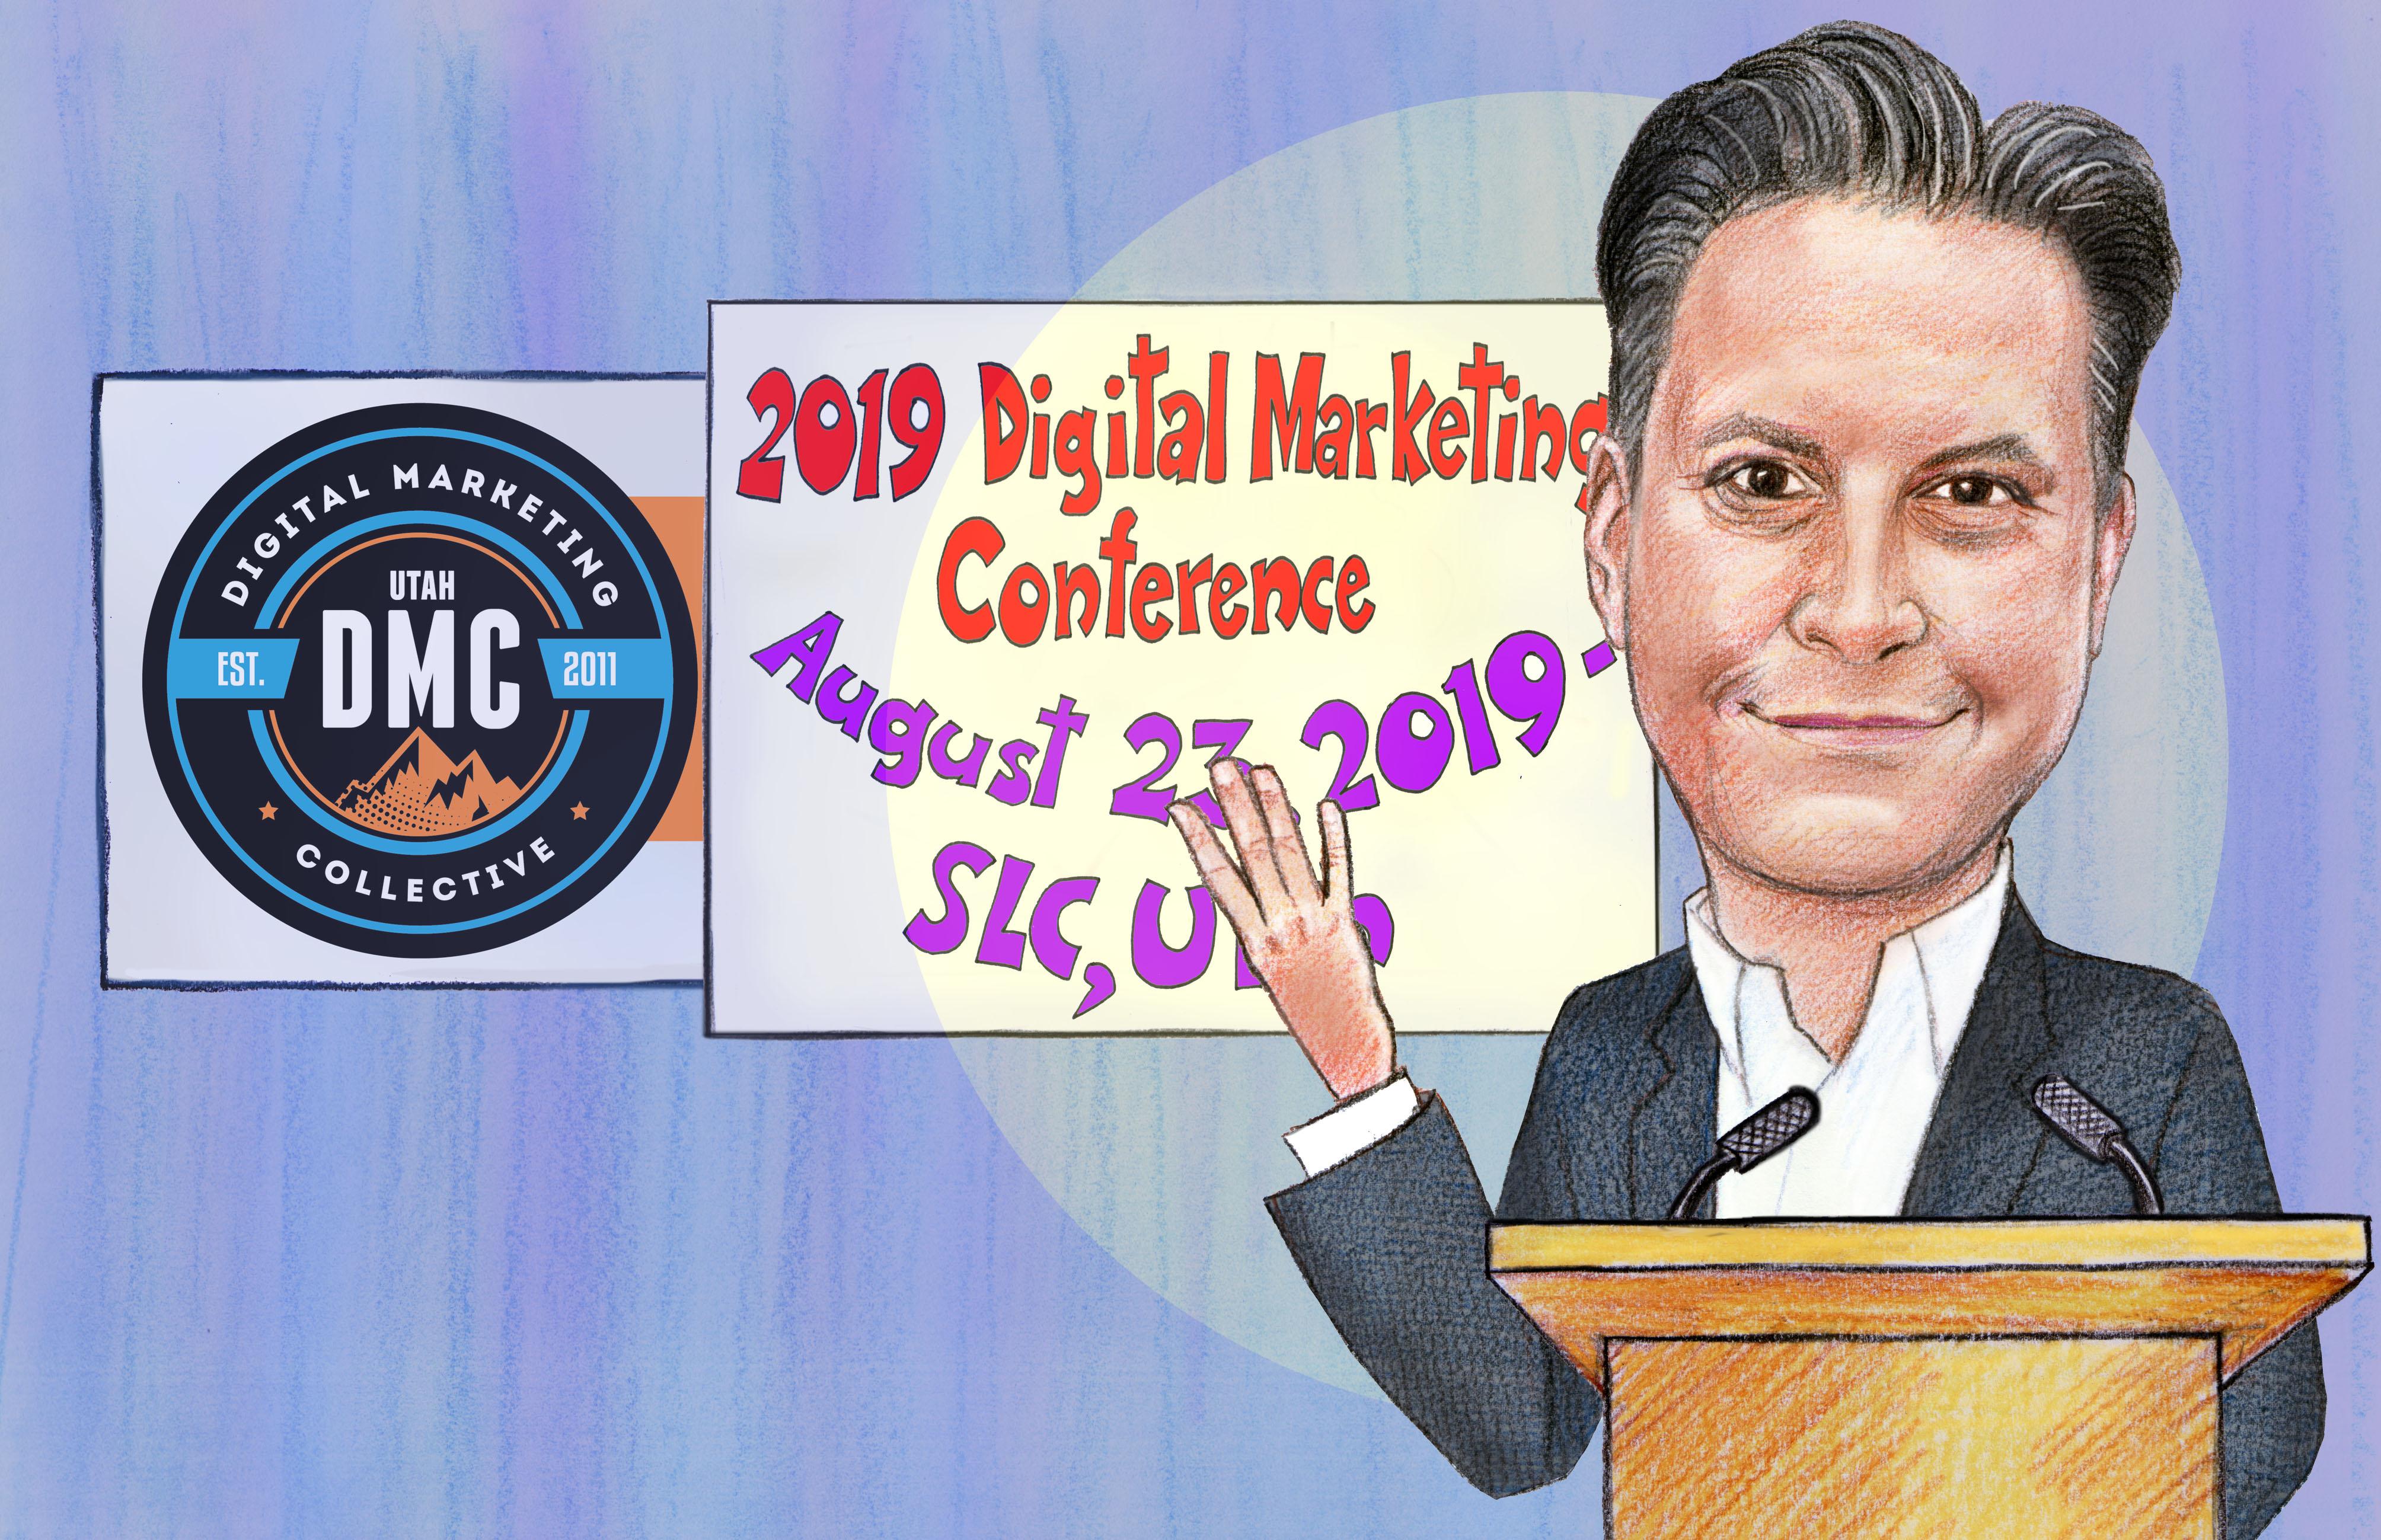 Duane Forrester |Utah DMC Conference Recap – August 2019